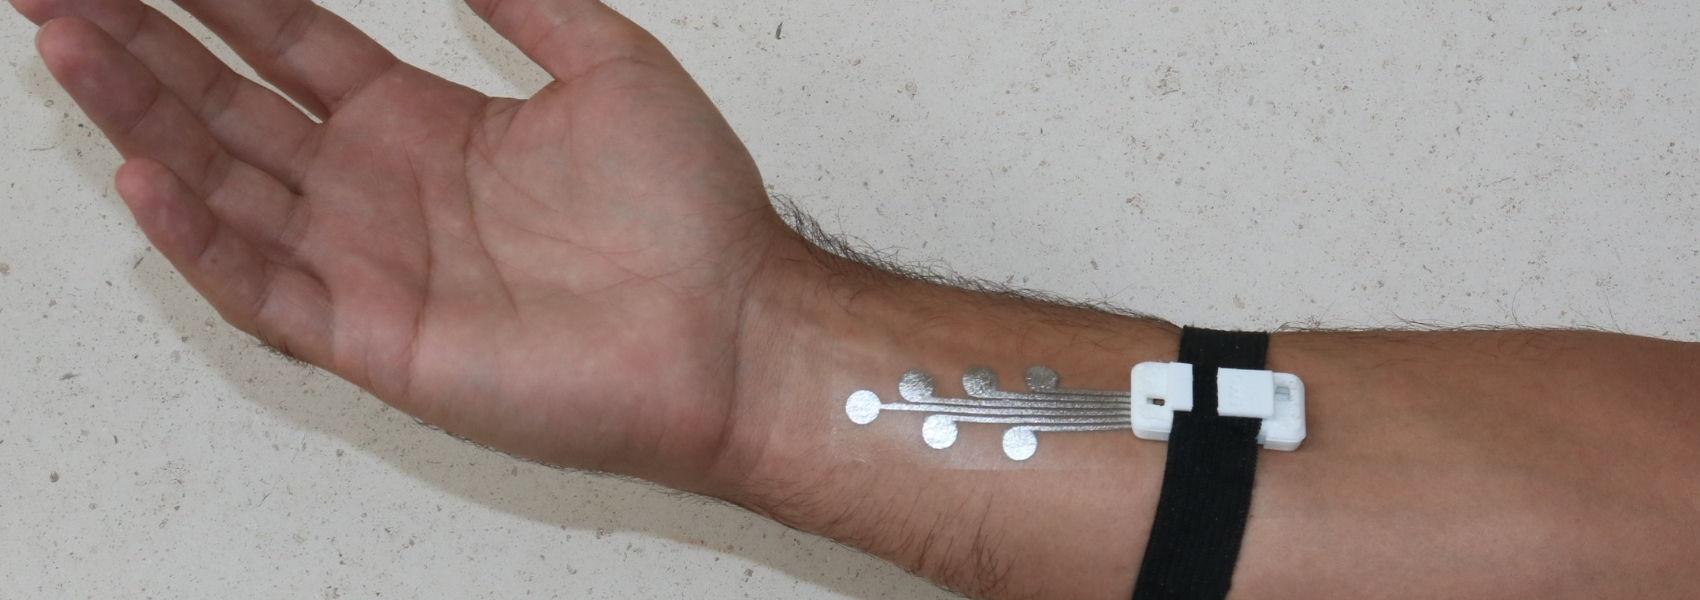 Tatuagens para monitorizar saúde